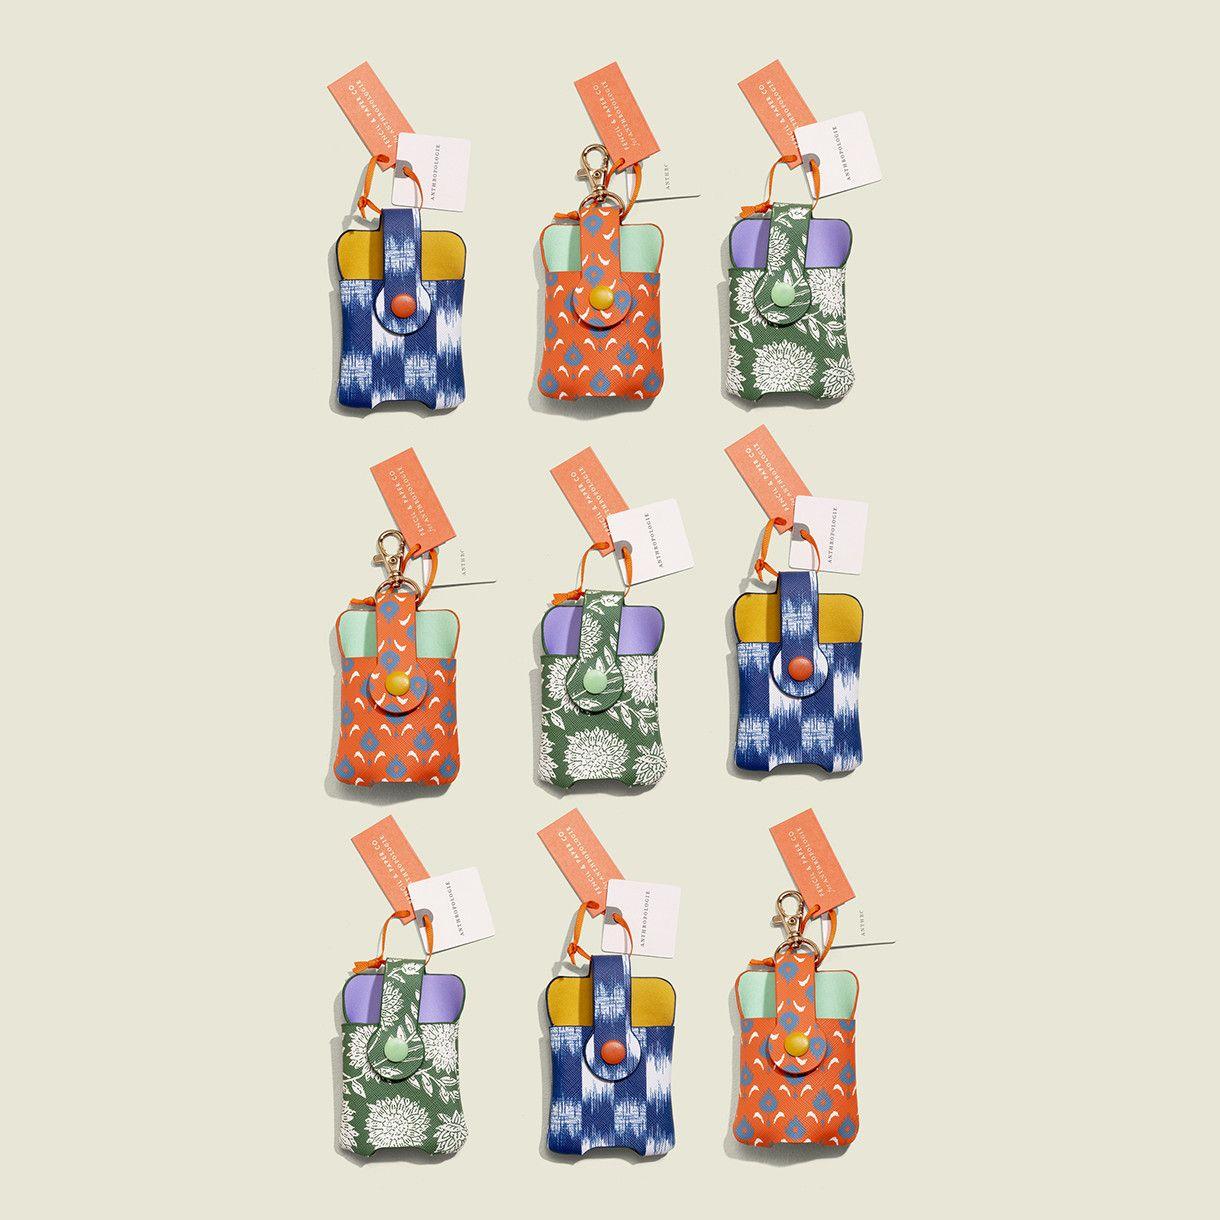 Sanitizer pouches